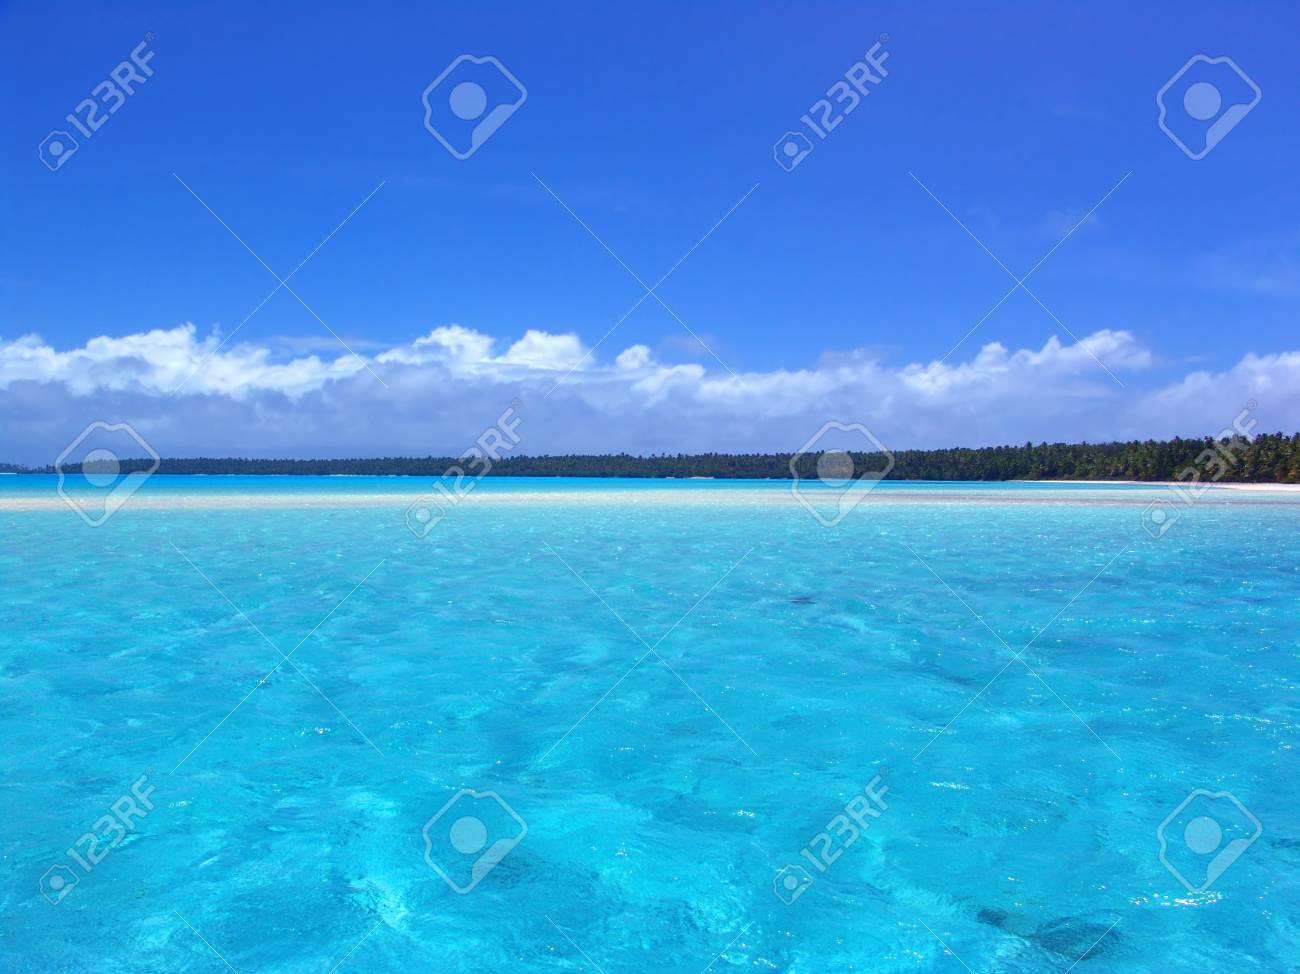 Ripples in Turquoise Lagoon Stock Photo - 207180